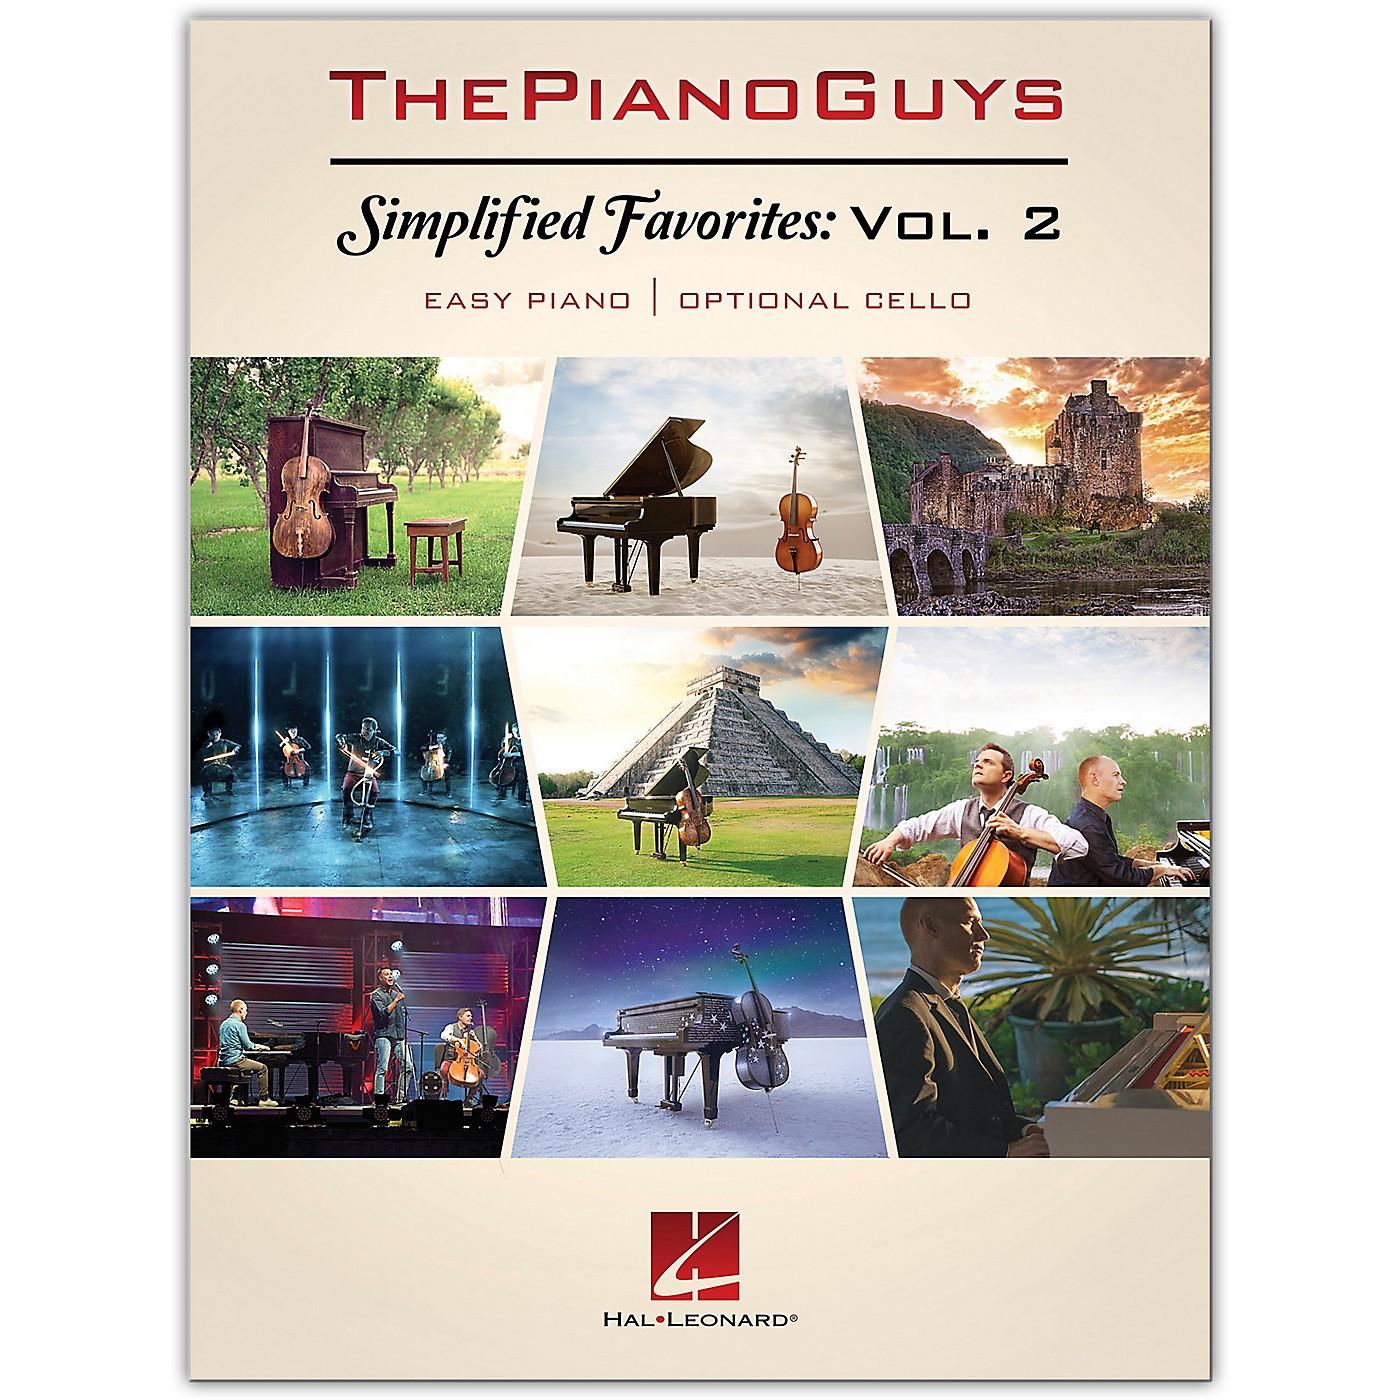 Hal Leonard The Piano Guys - Simplified Favorites, Volume 2 Easy Piano/ Opt. Cello thumbnail